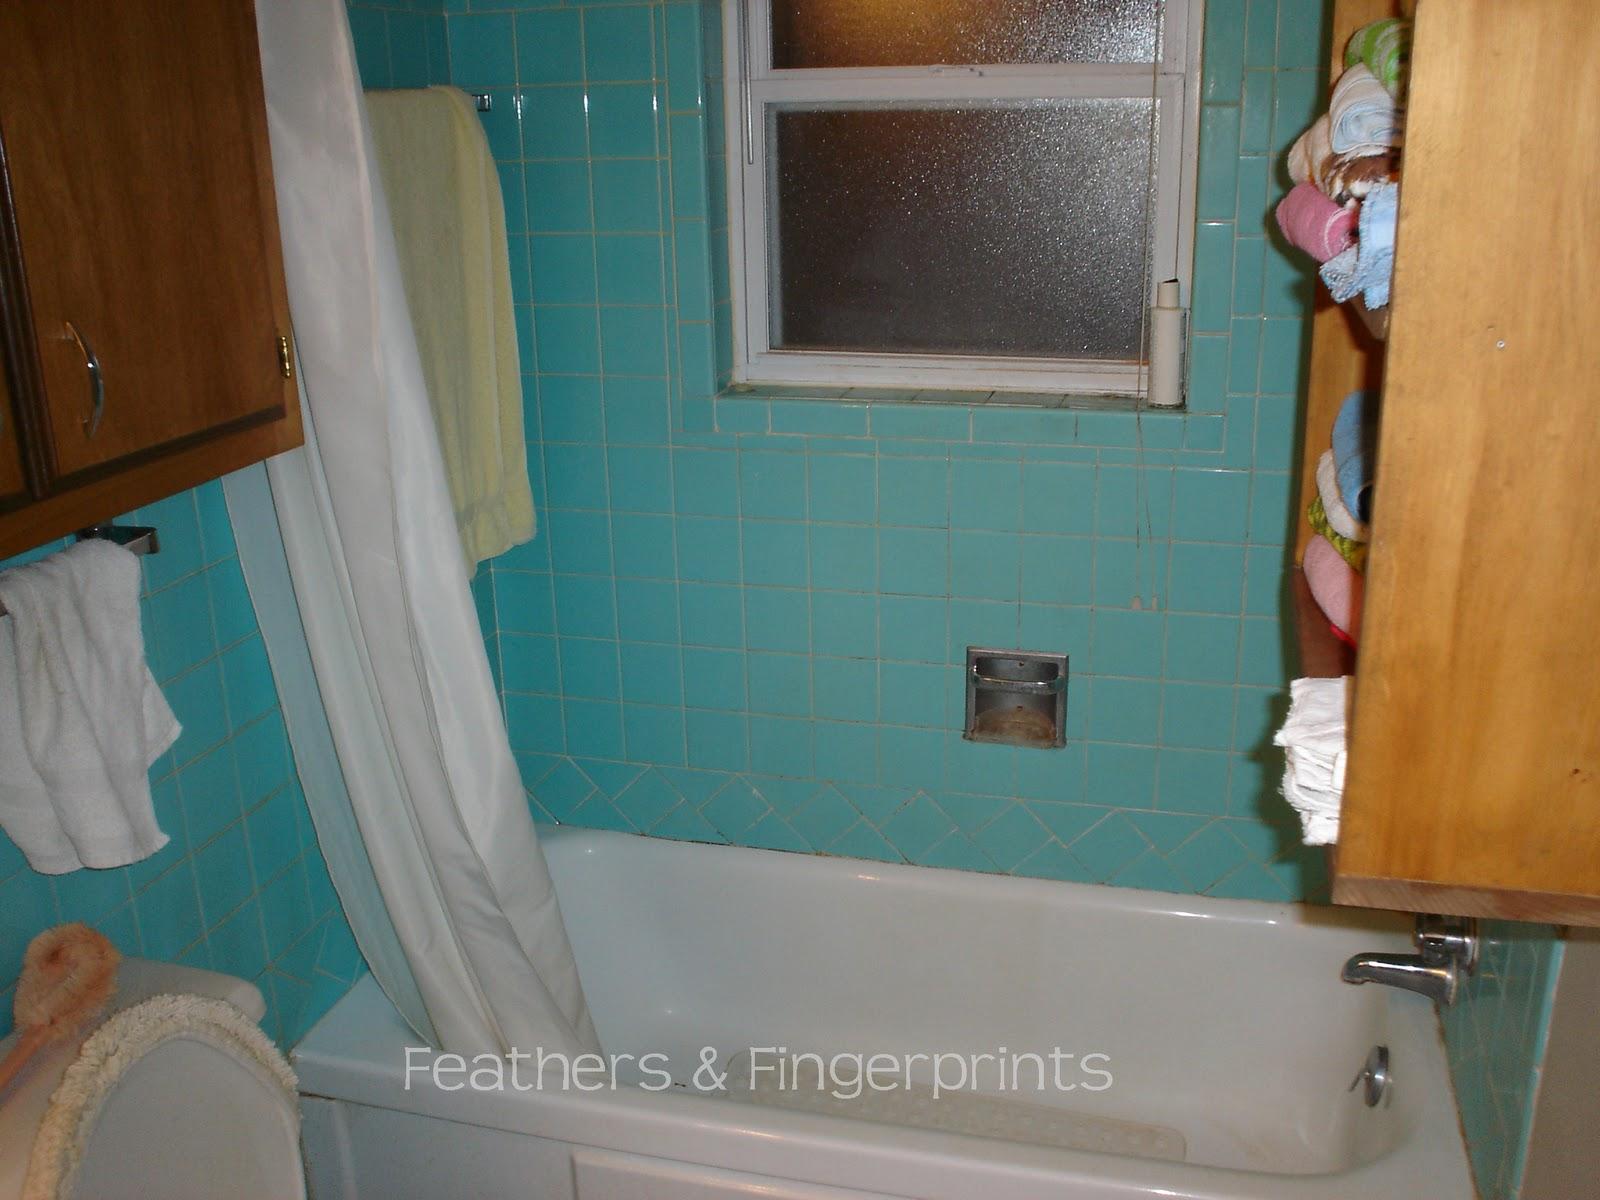 Wallpaper Behind Toilet | Free Download Wallpaper | DaWallpaperz